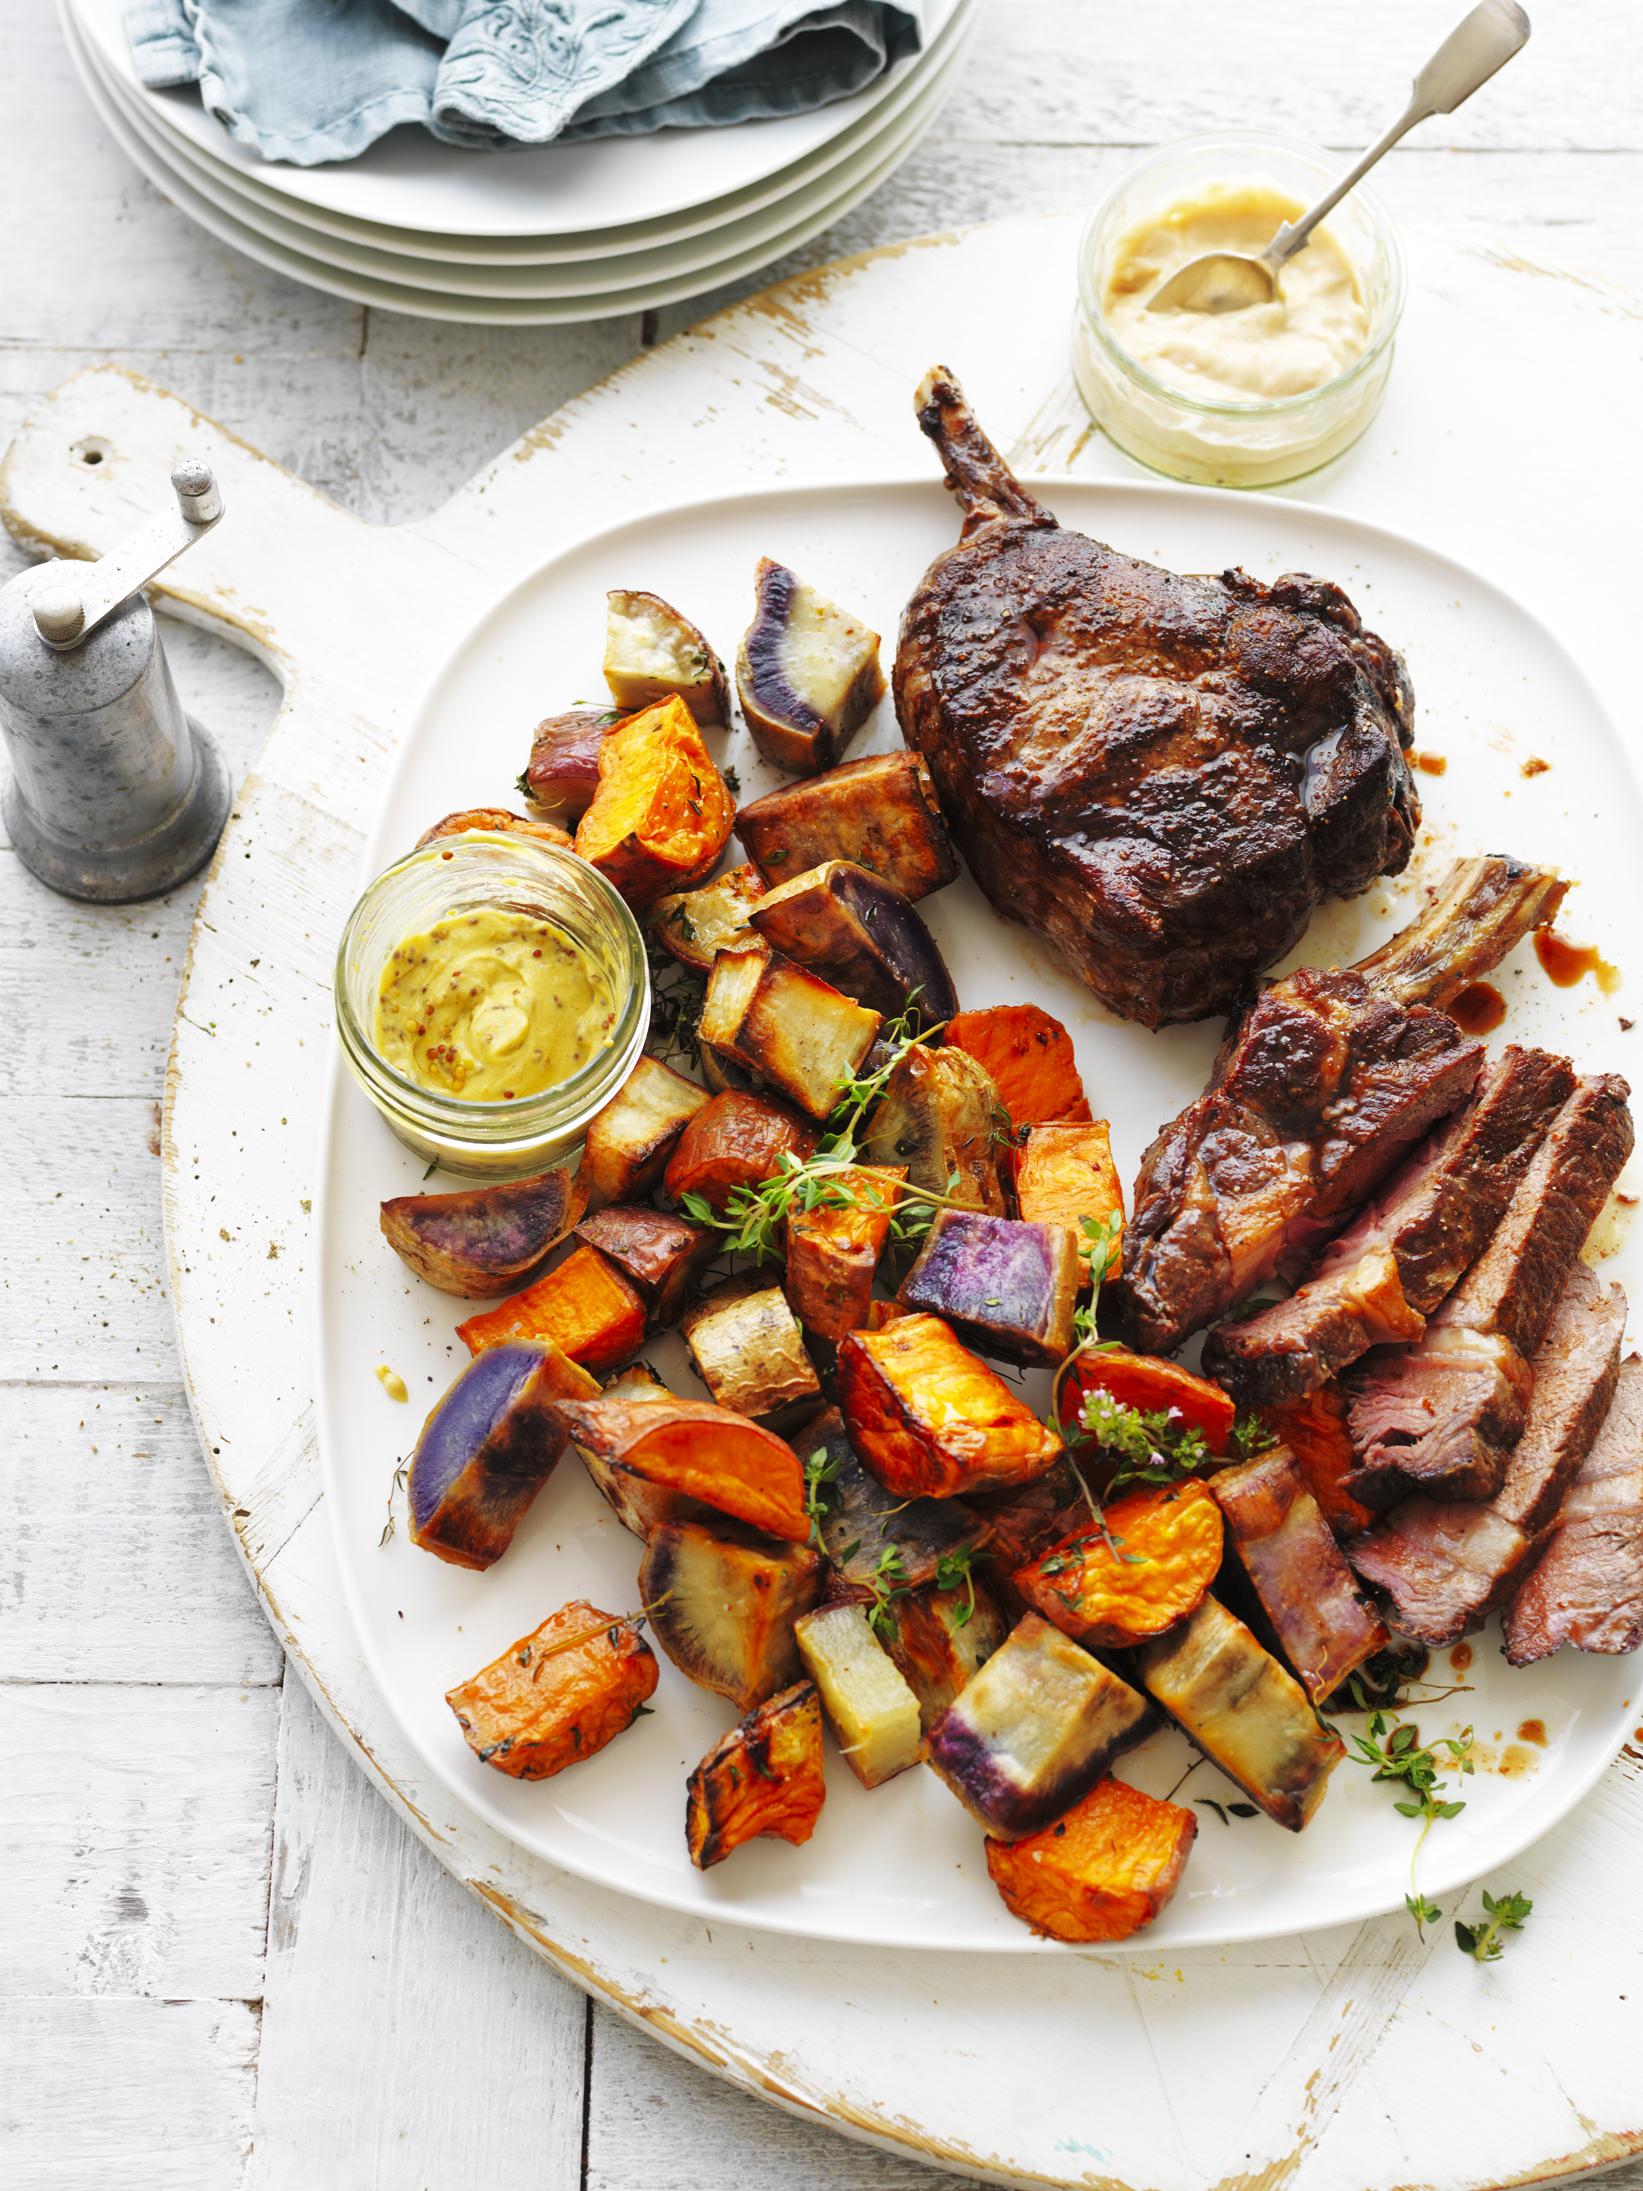 Roast Sweet Potato Medley with Rib-Eye Steak